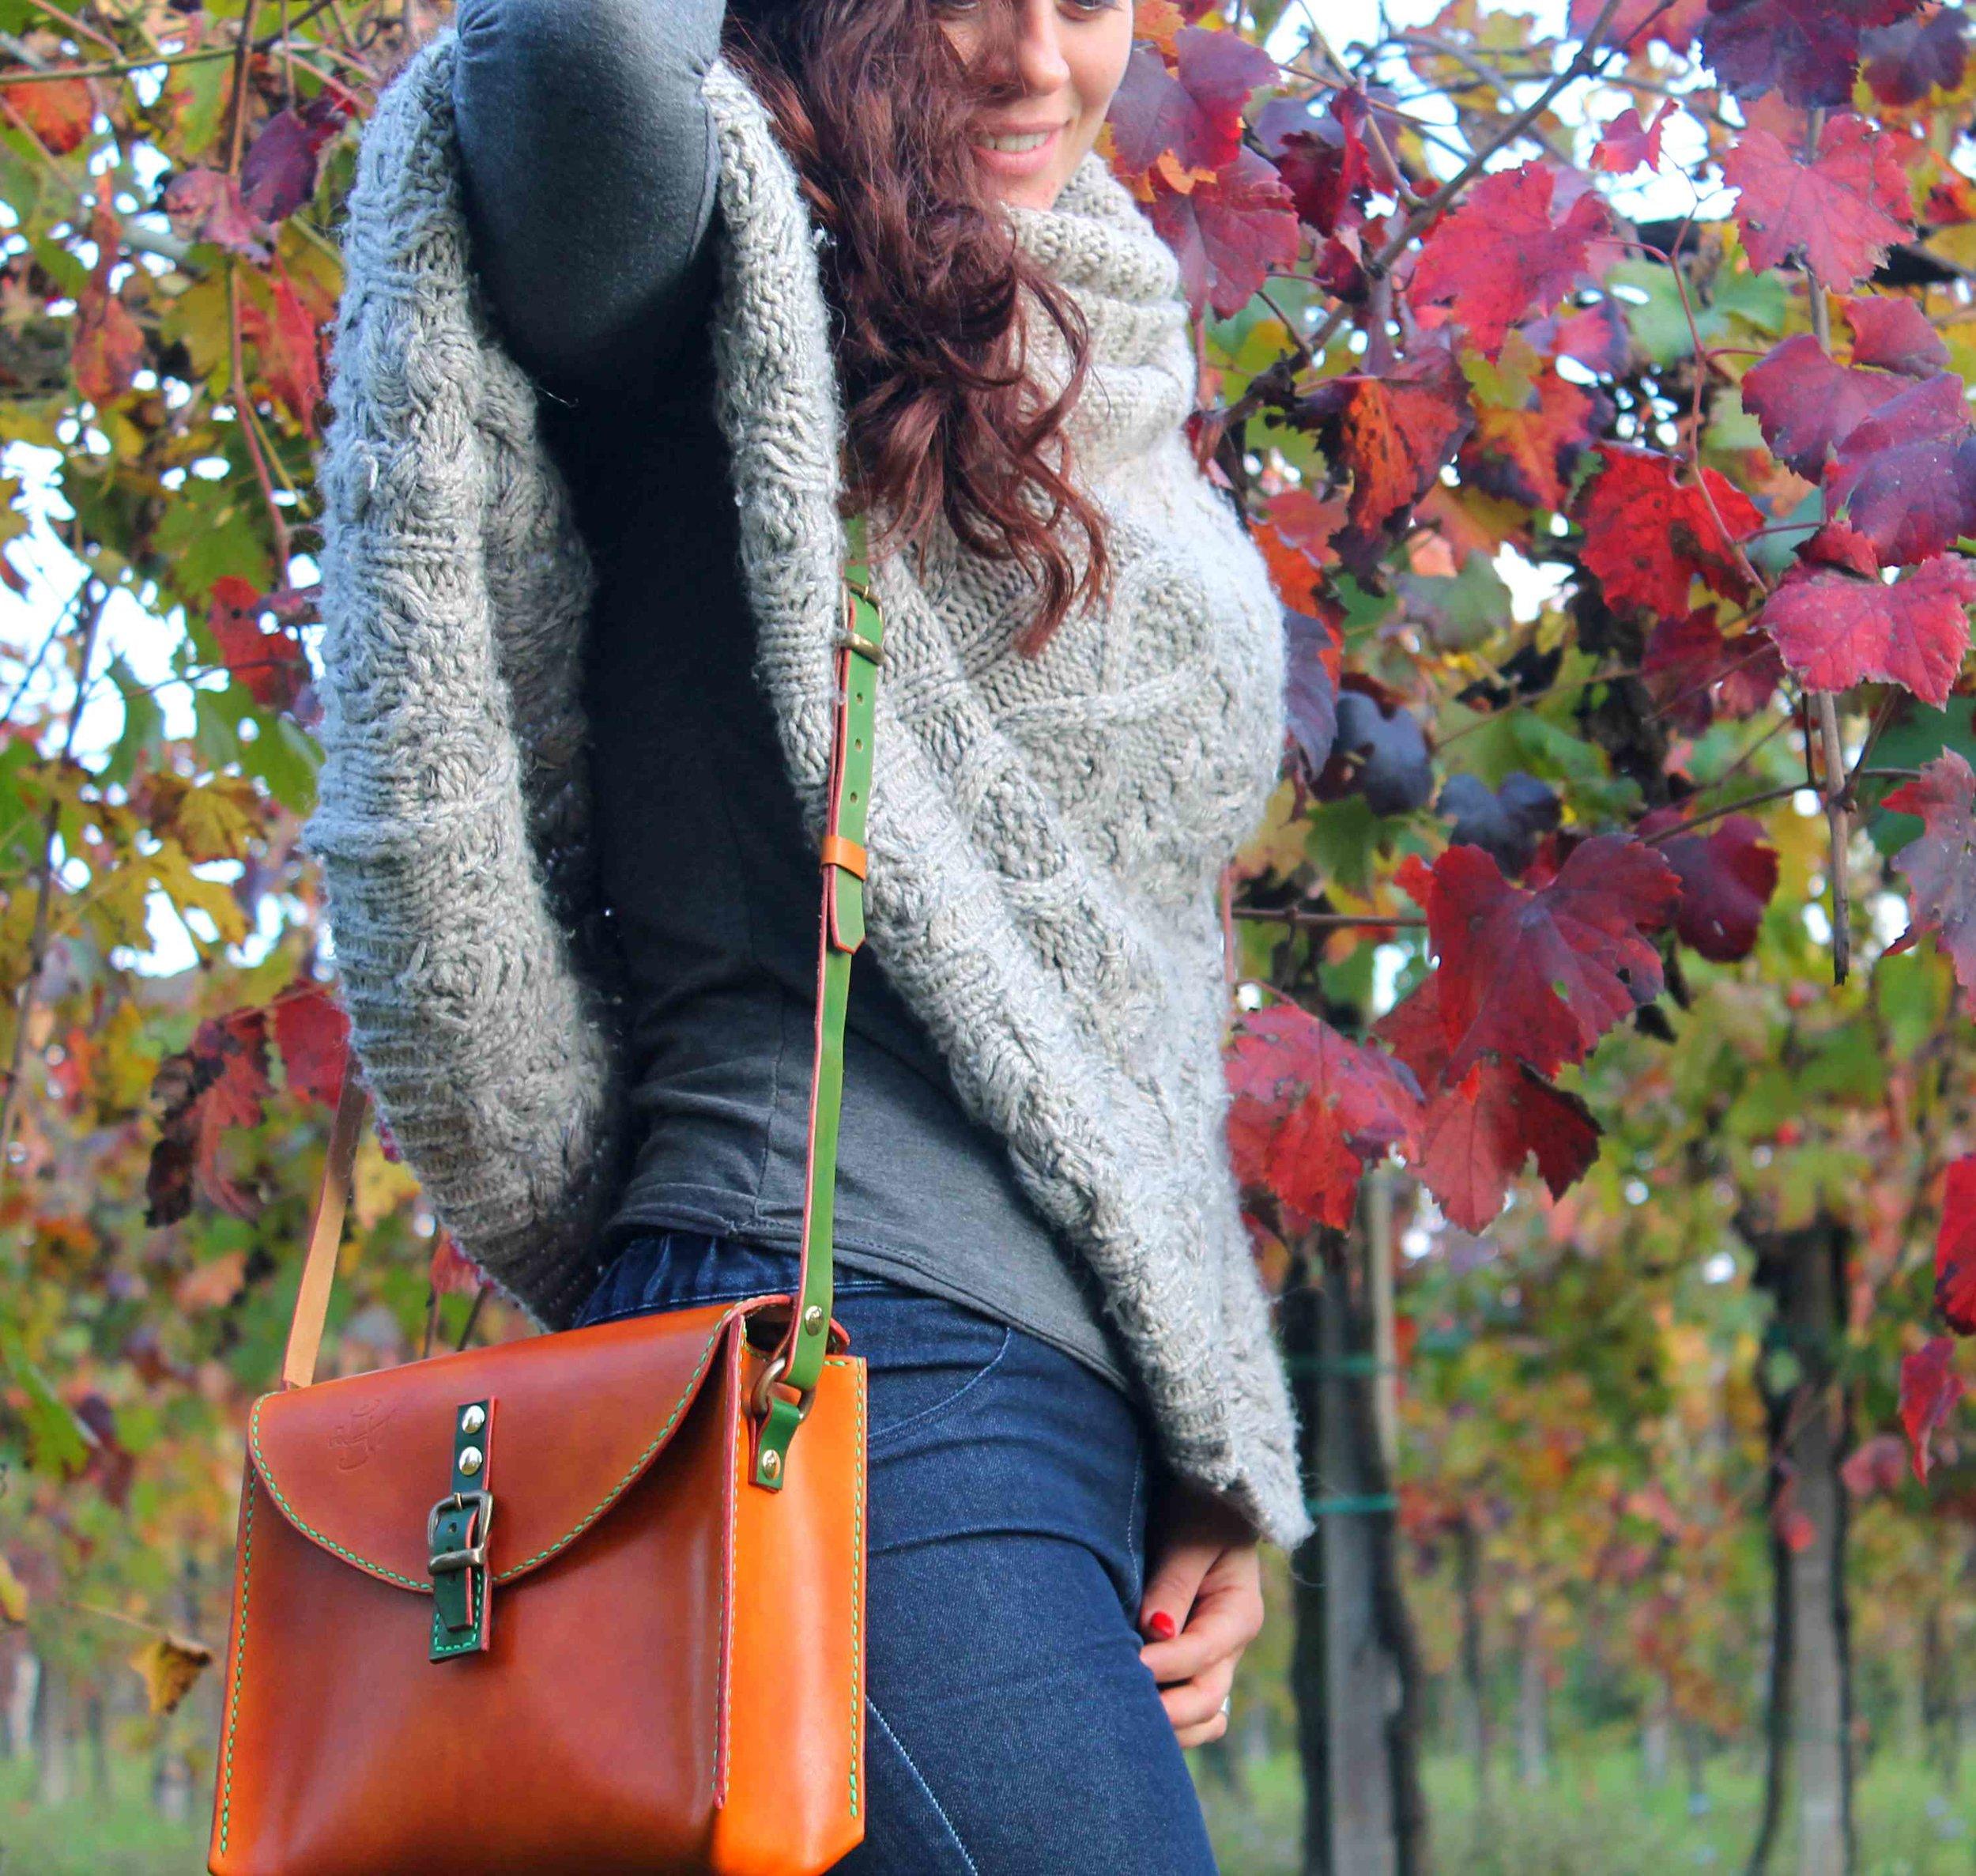 Autunno 1 #statusquoio #cuoio #bag #vigna #autumn #wave.jpg